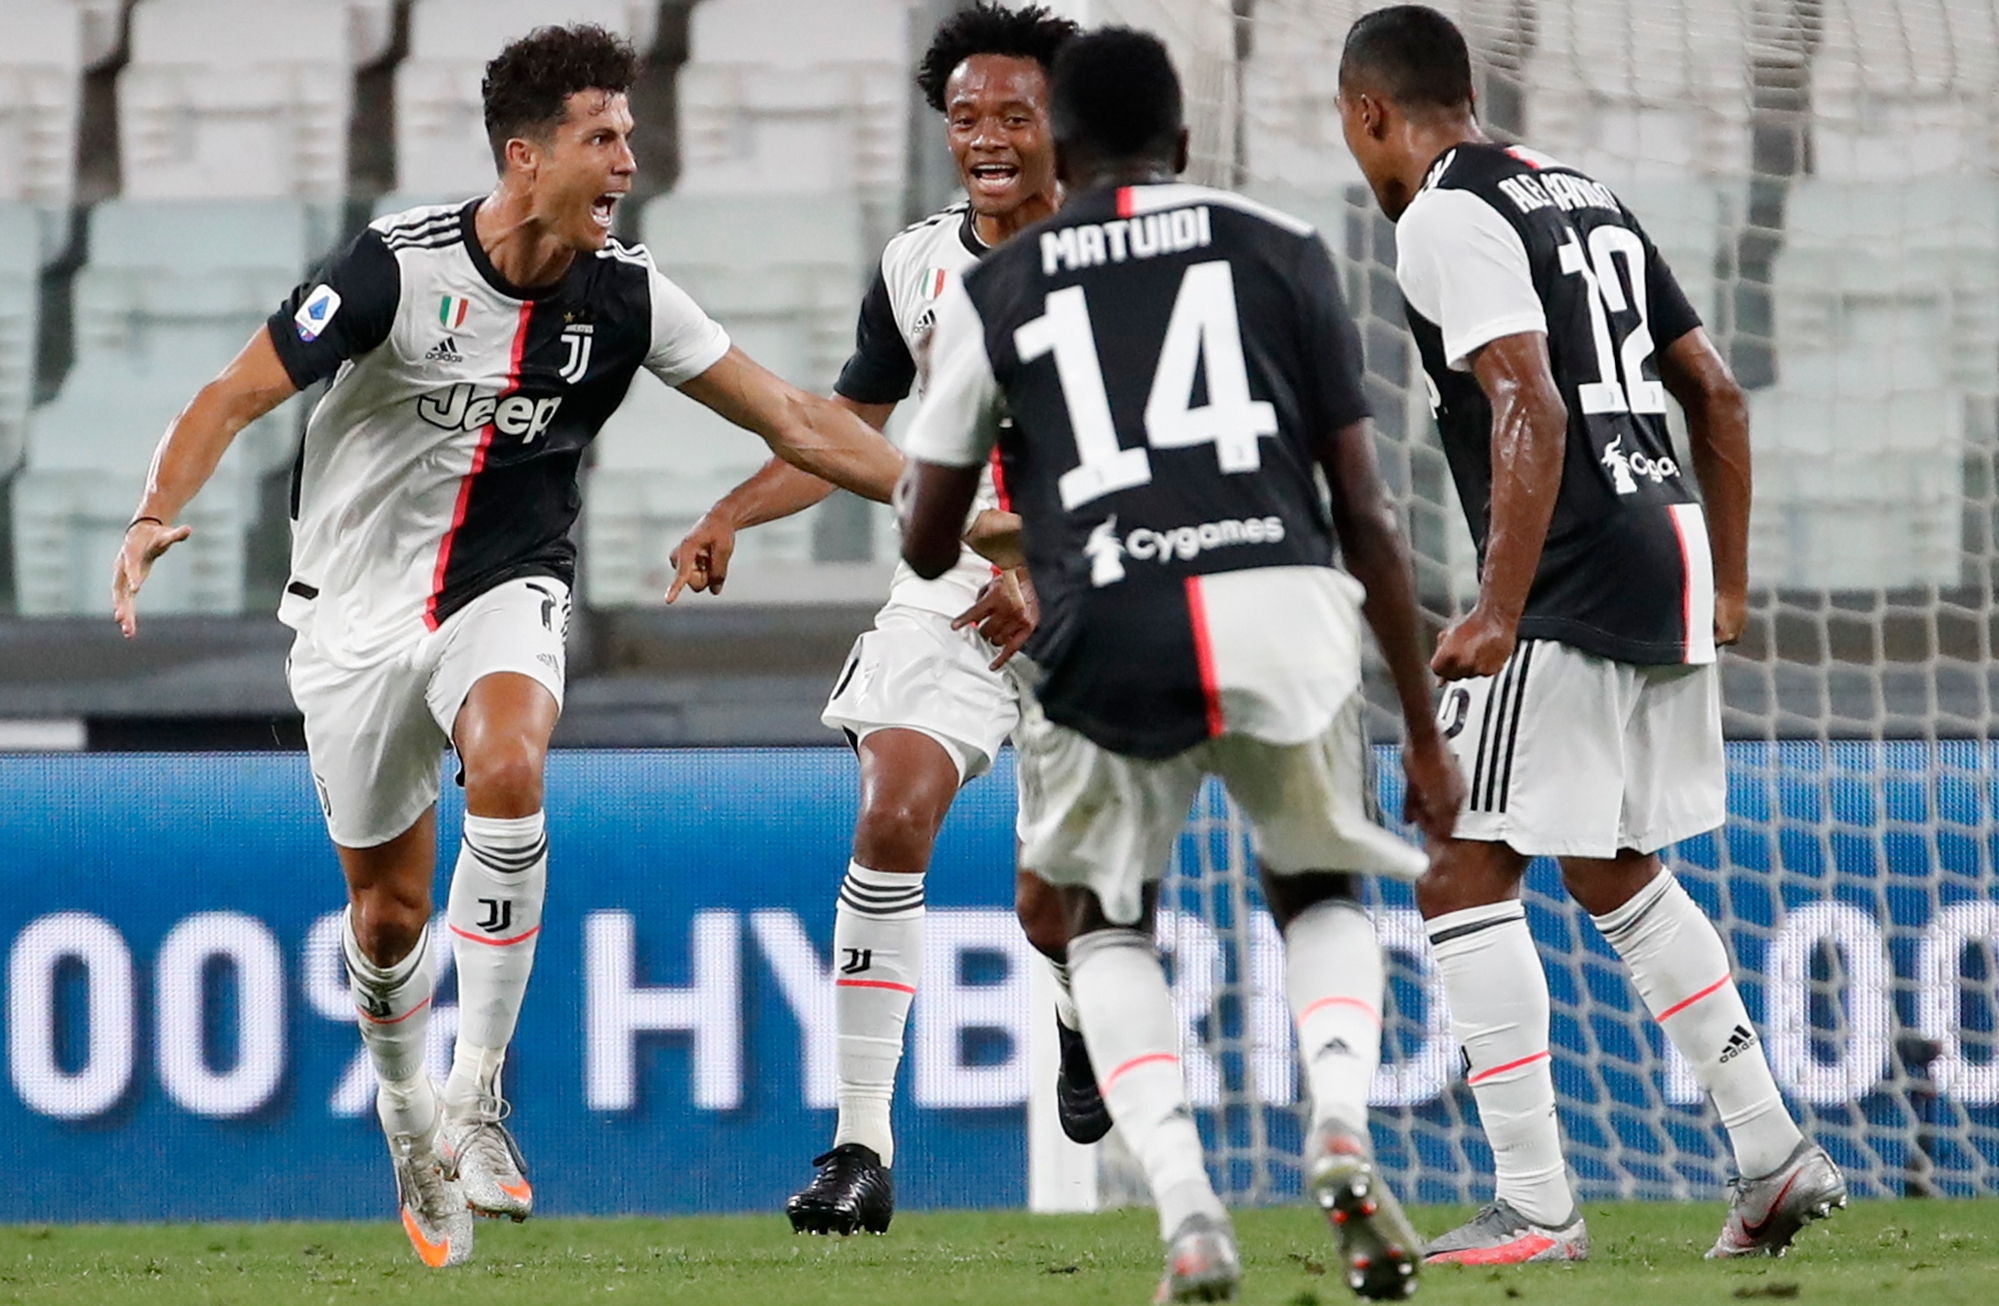 Juventus Vs Lyon Free Live Stream 8 7 20 Watch Uefa Champions League Round Of 16 Online Time Tv Channel Nj Com